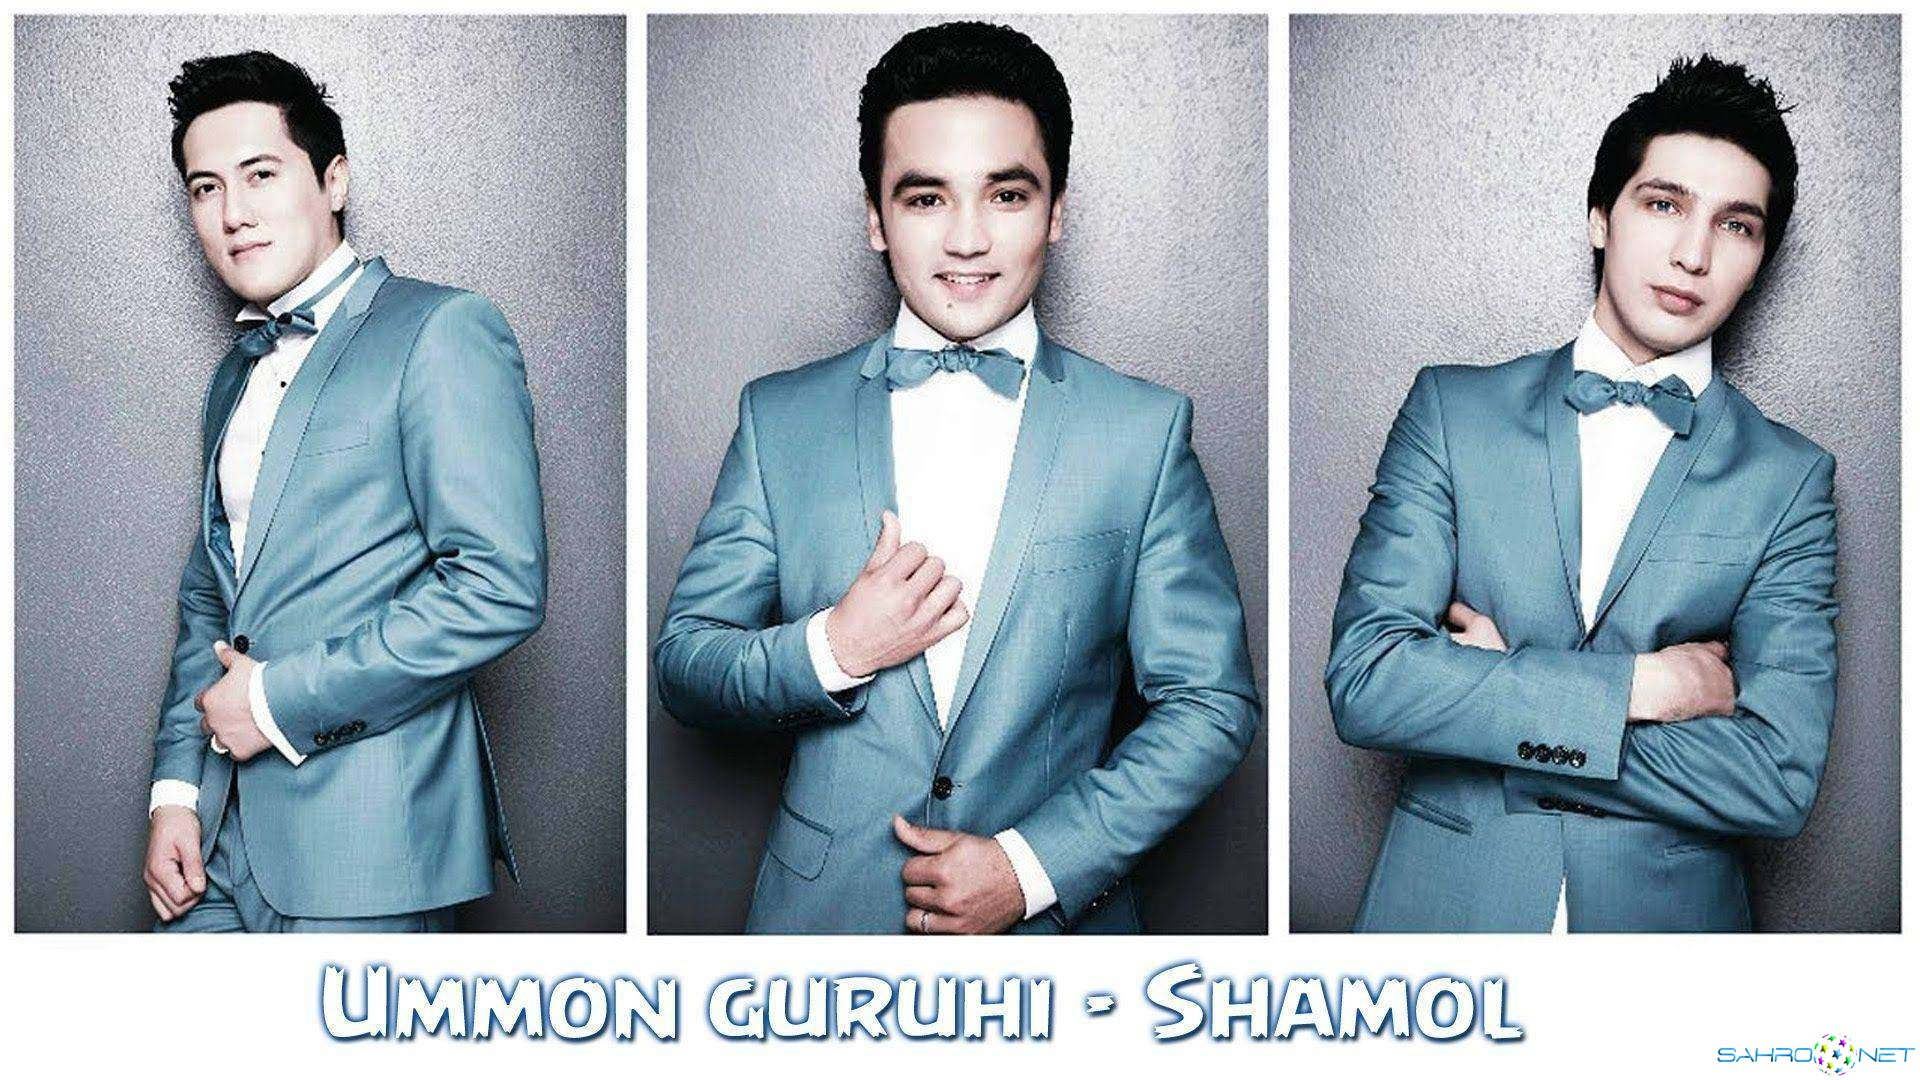 Ummon guruhi - Shamol Янги Узб mp3 2015 скачать онлайн